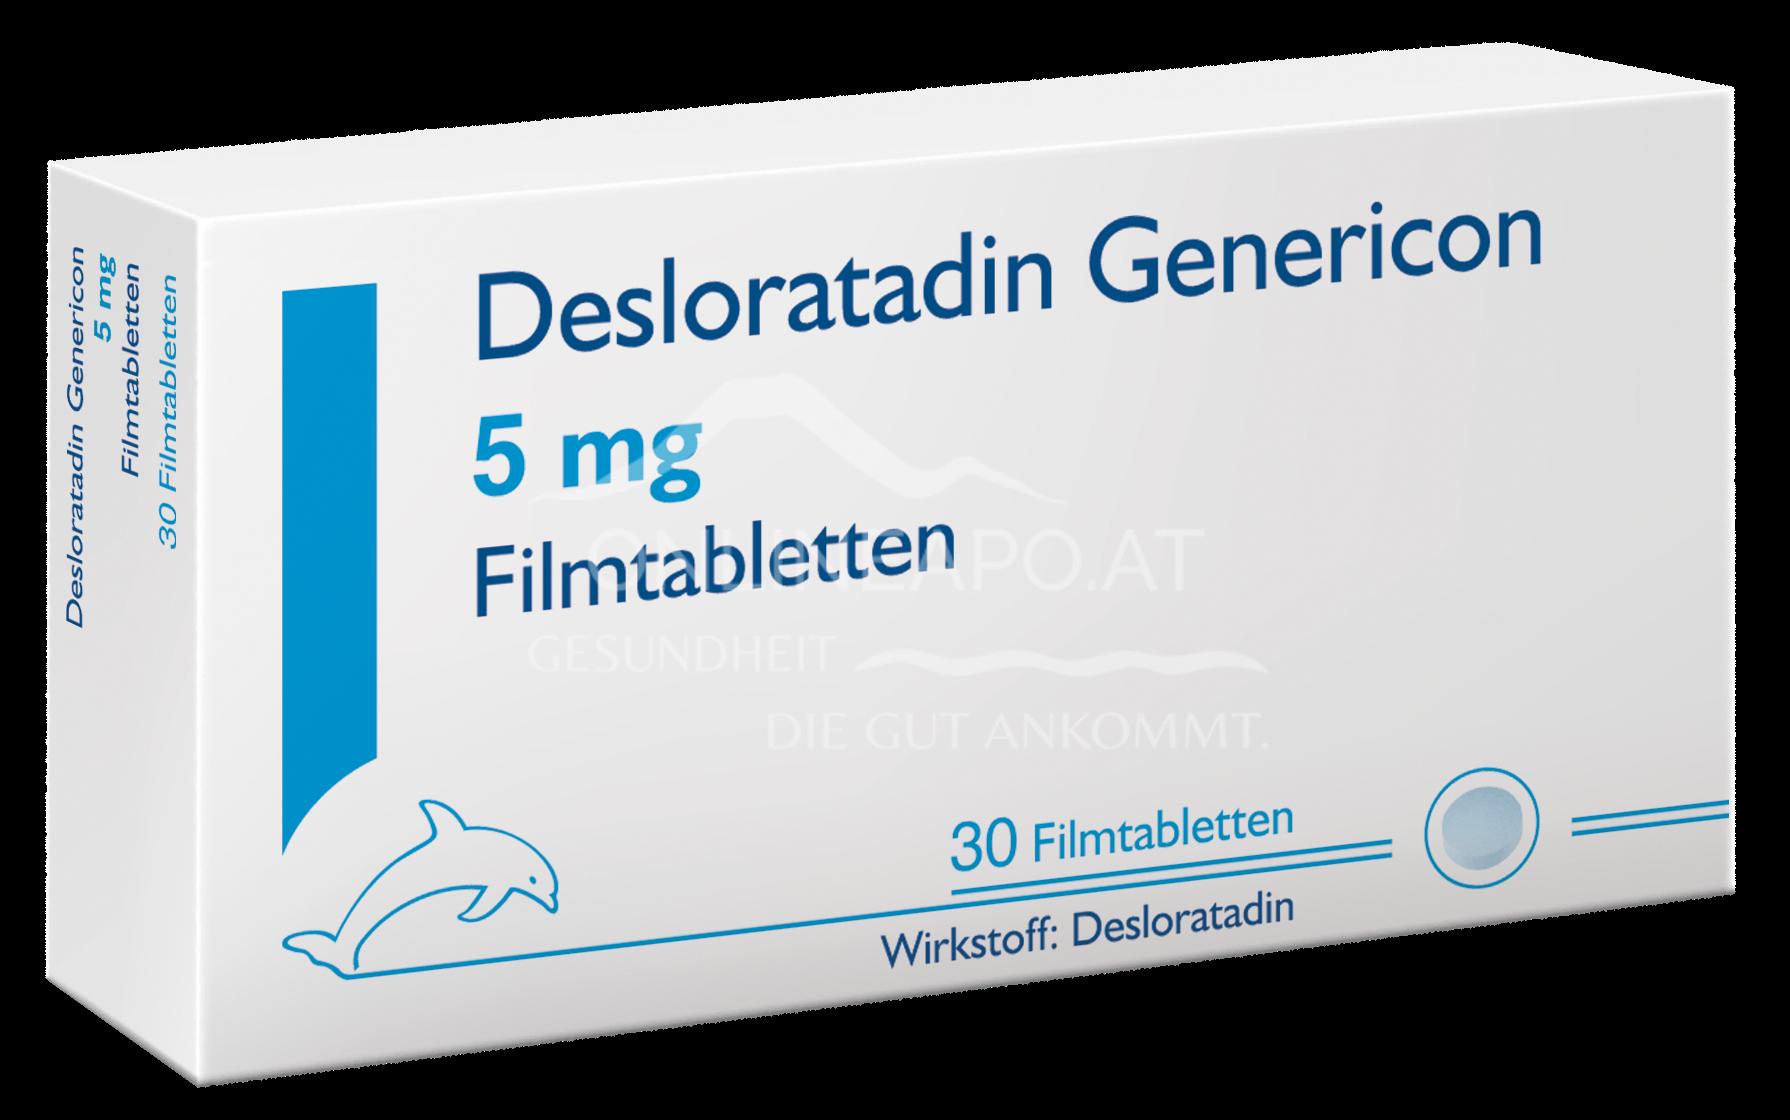 Desloratadin Genericon Filmtabletten 5 mg